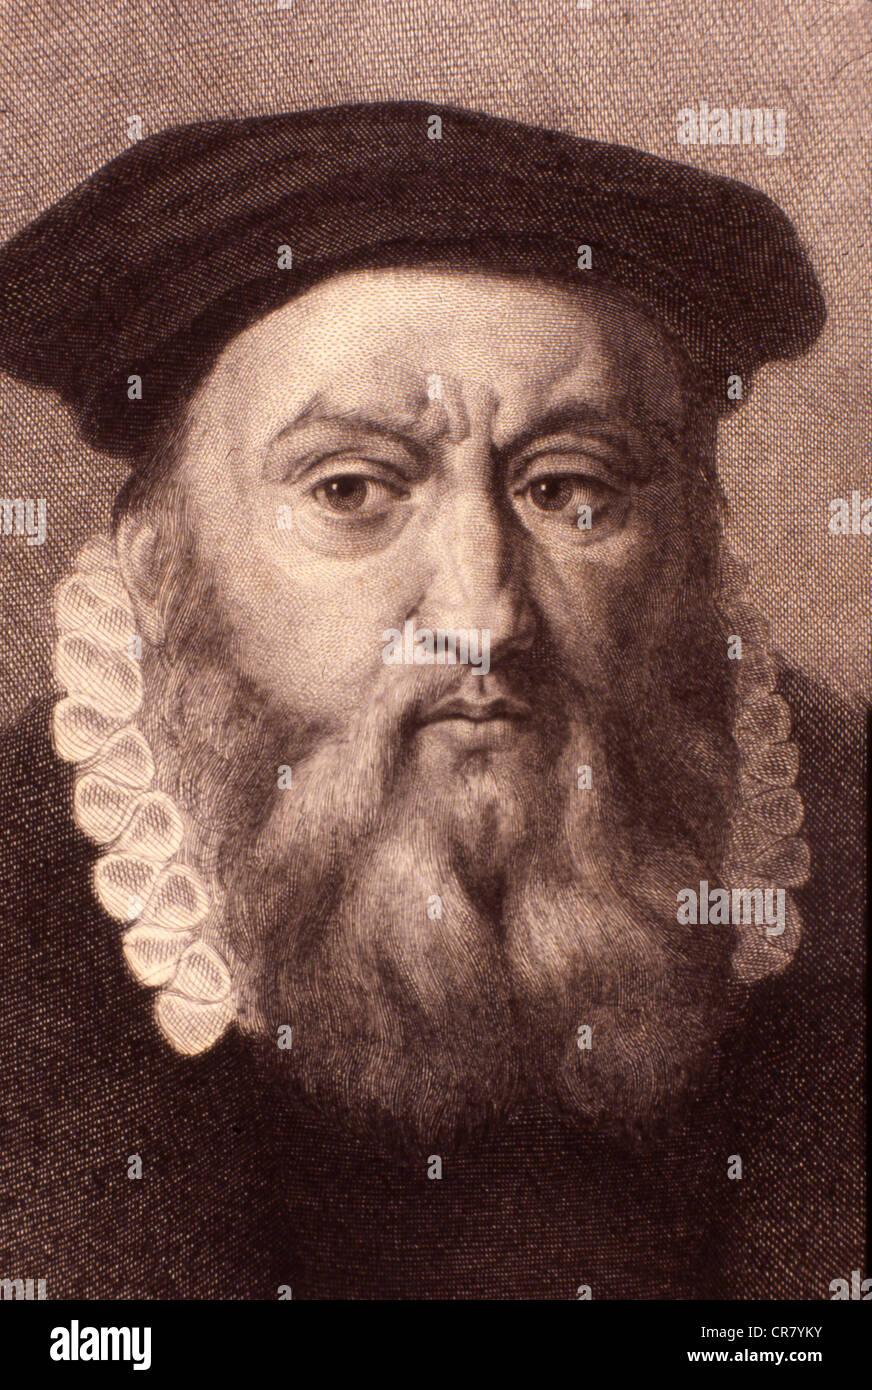 Jean Calvin, French religion reformer, 1509 - 1564, historical engraving, 1860 - Stock Image